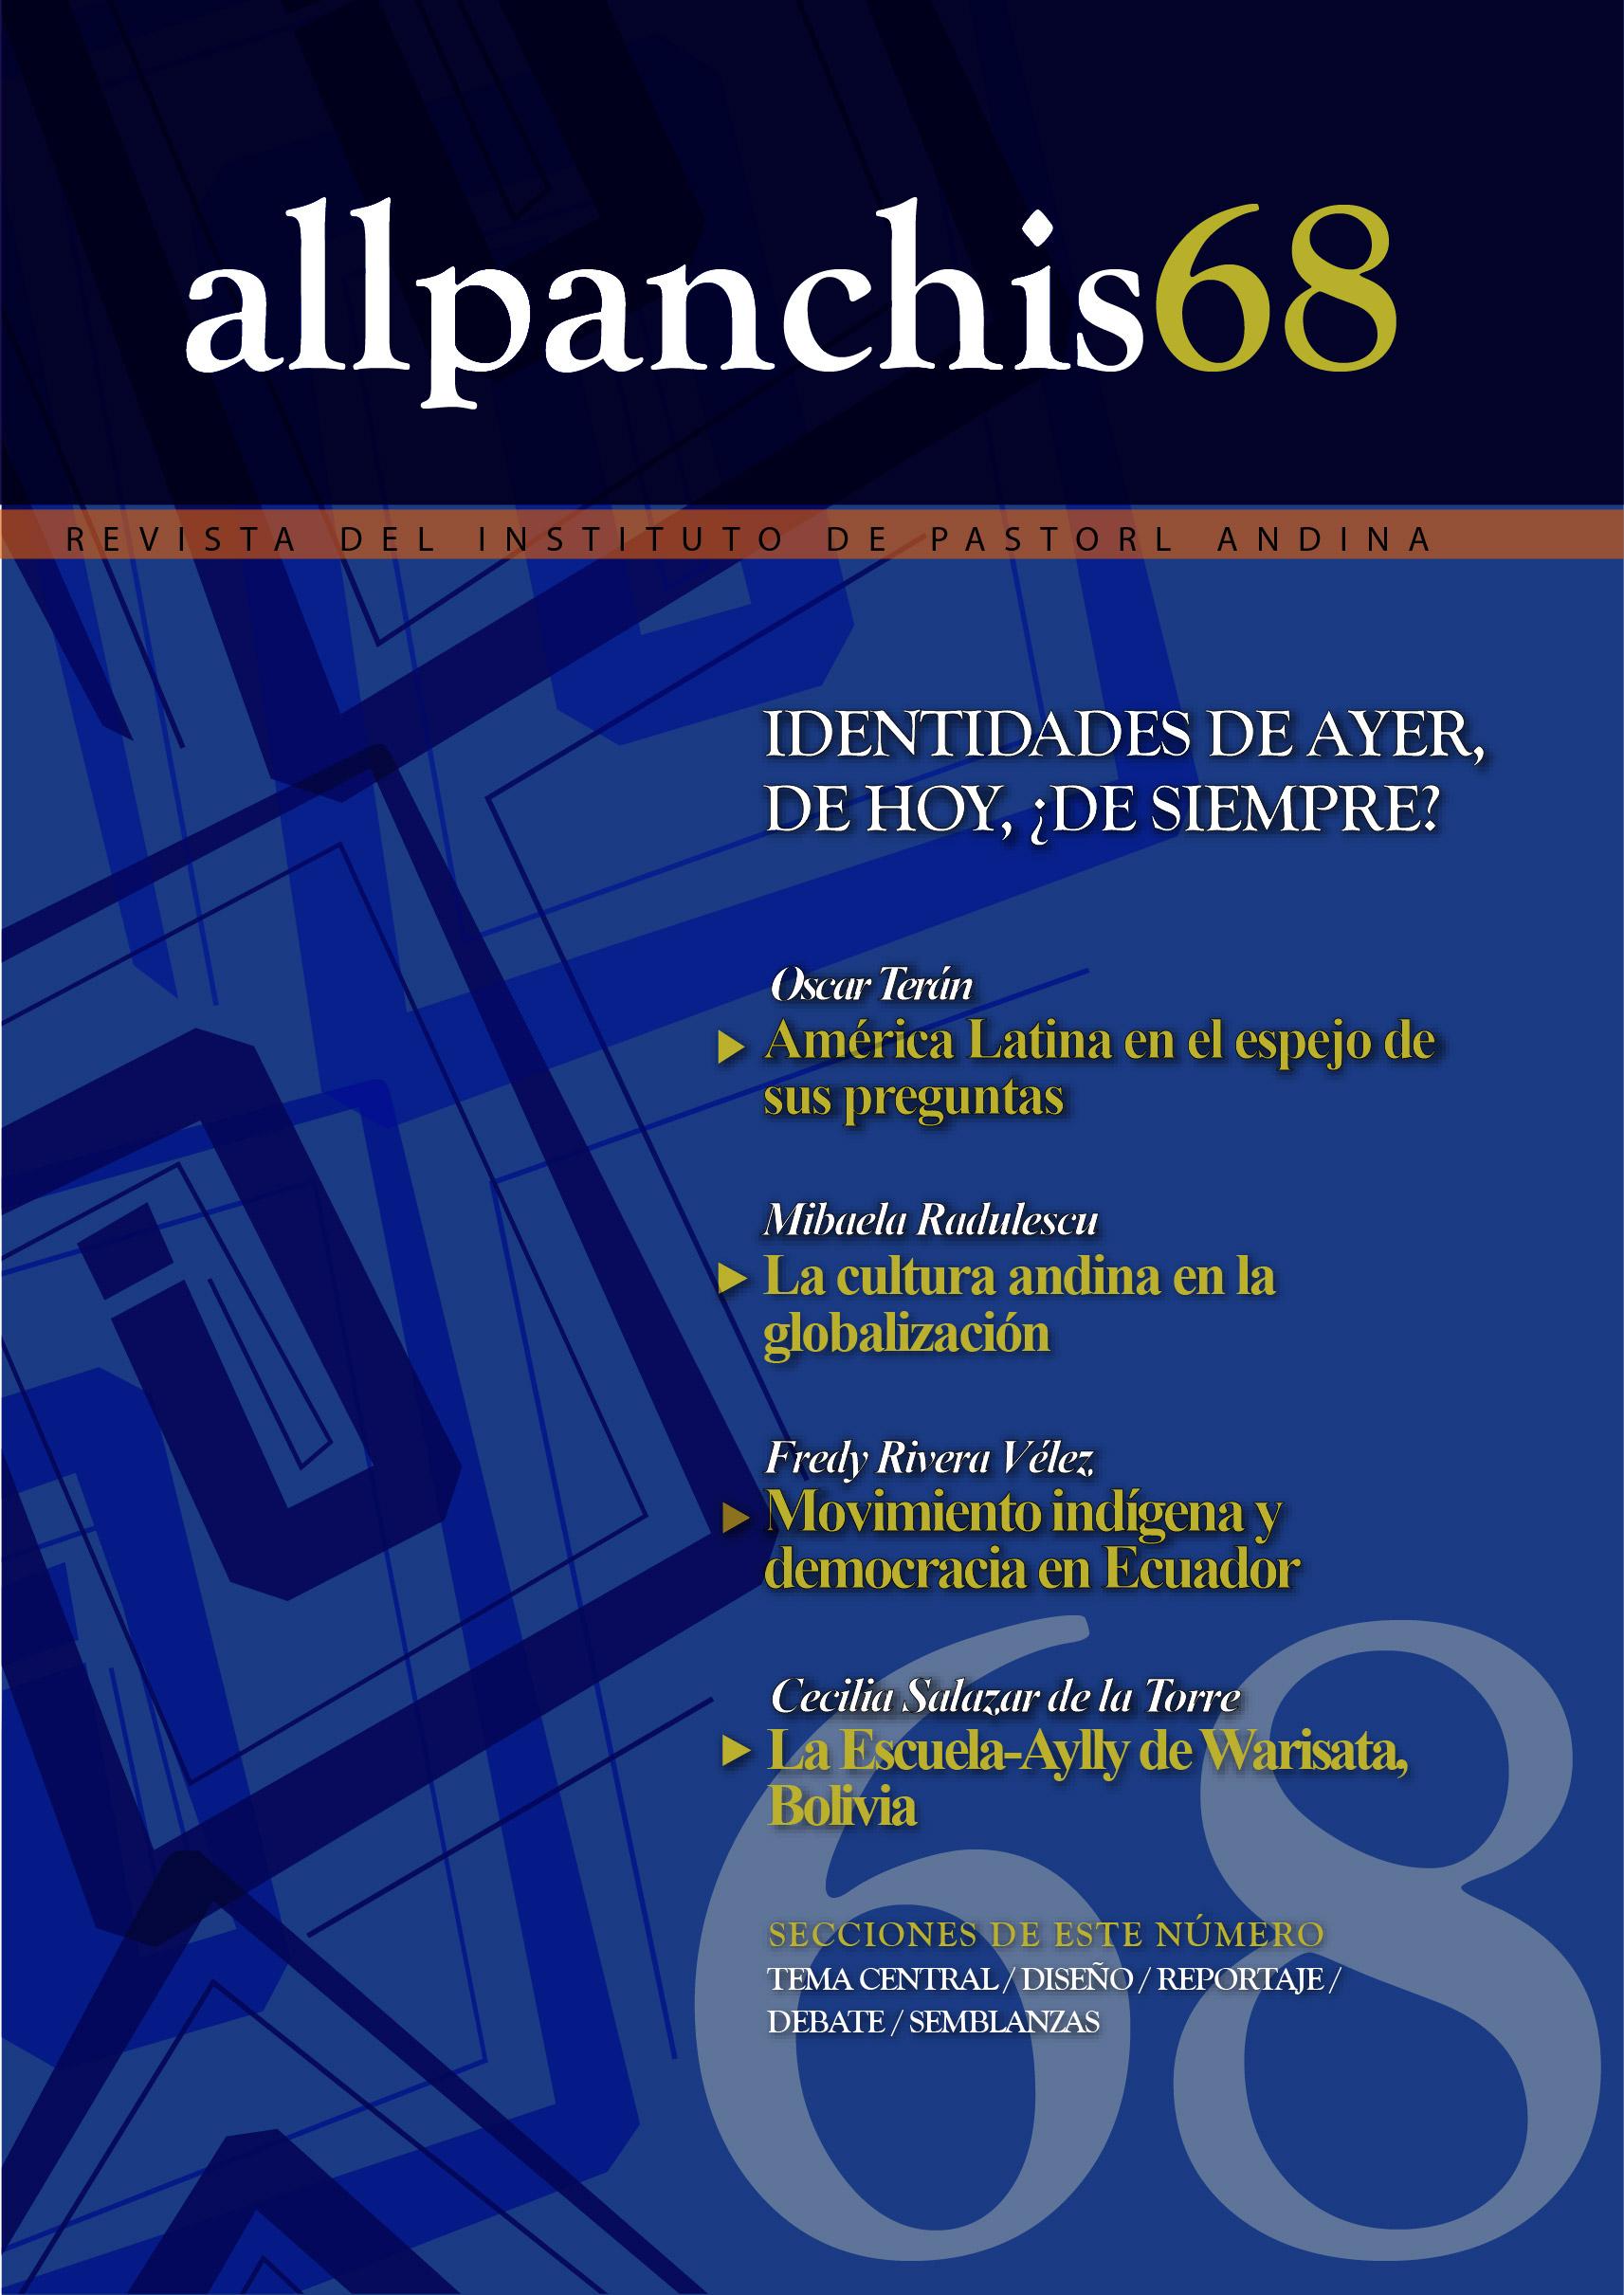 Allpanchis 68